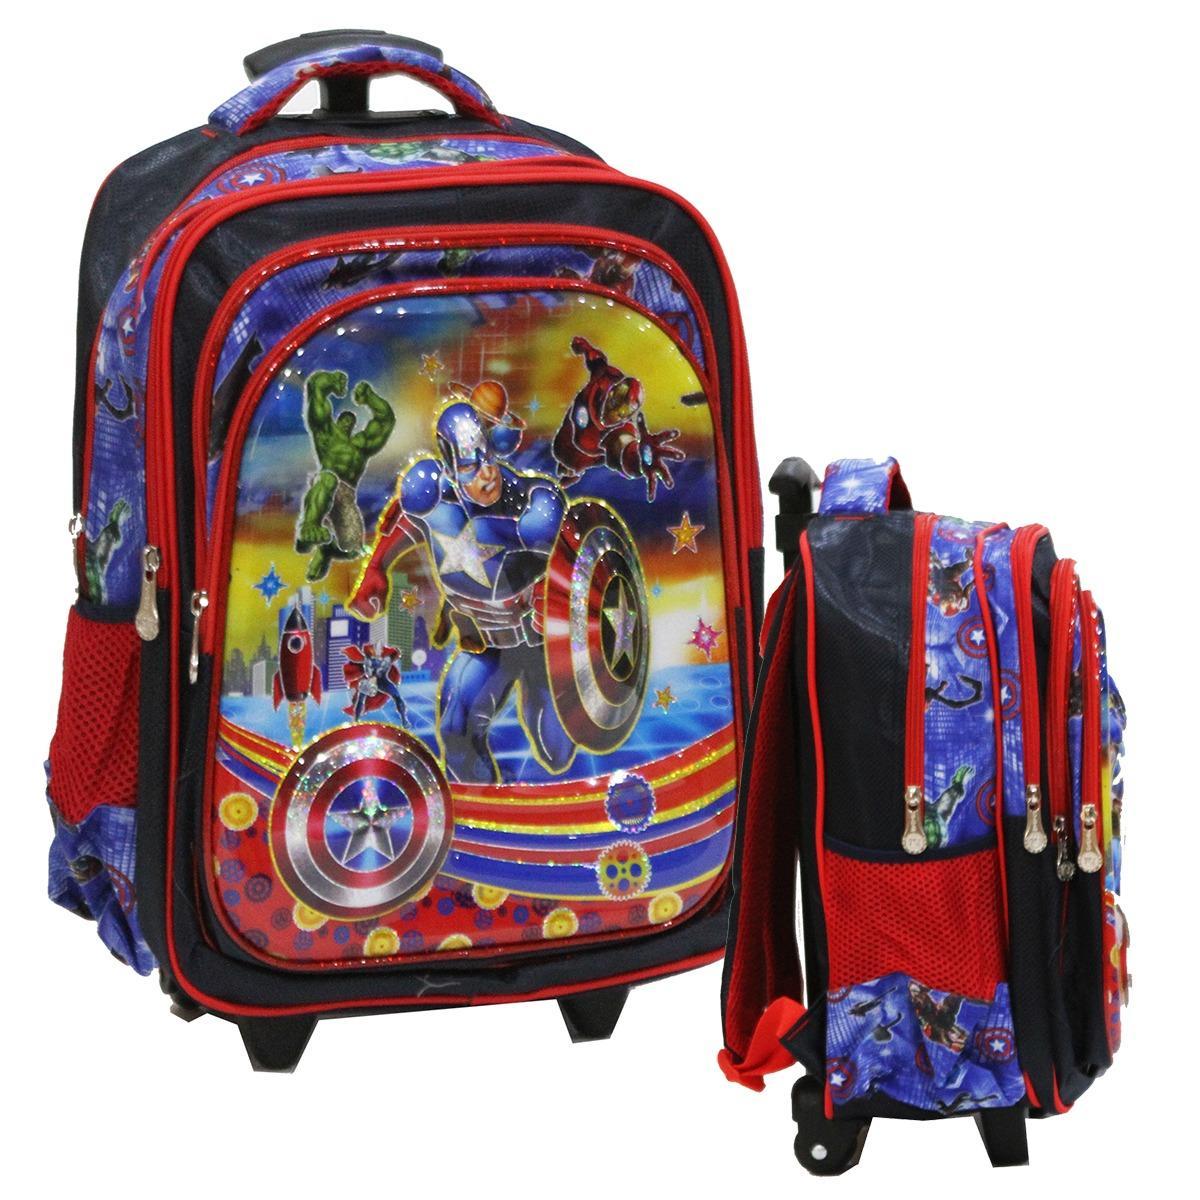 Beli Onlan Marvel Avengers Captain America 6D Timbul Anti Gores Tas Trolley Anak Sekolah Ukuran Sd Import Onlan Asli